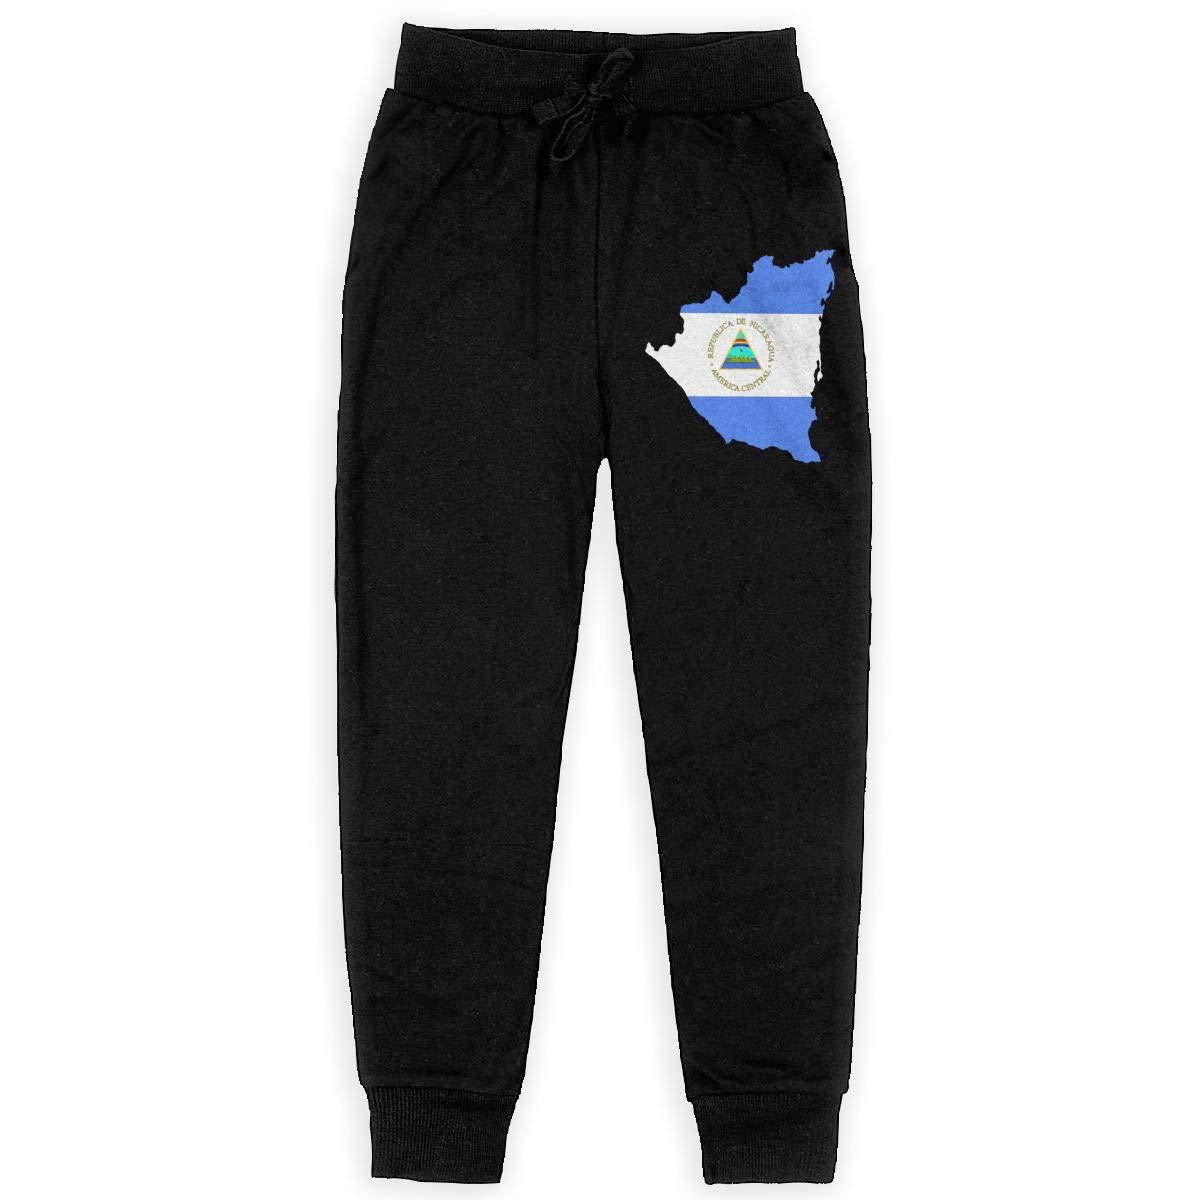 IufnNRJndfu Nicaragua Boys Athletic Smart Fleece Pant Youth Soft and Cozy Sweatpants